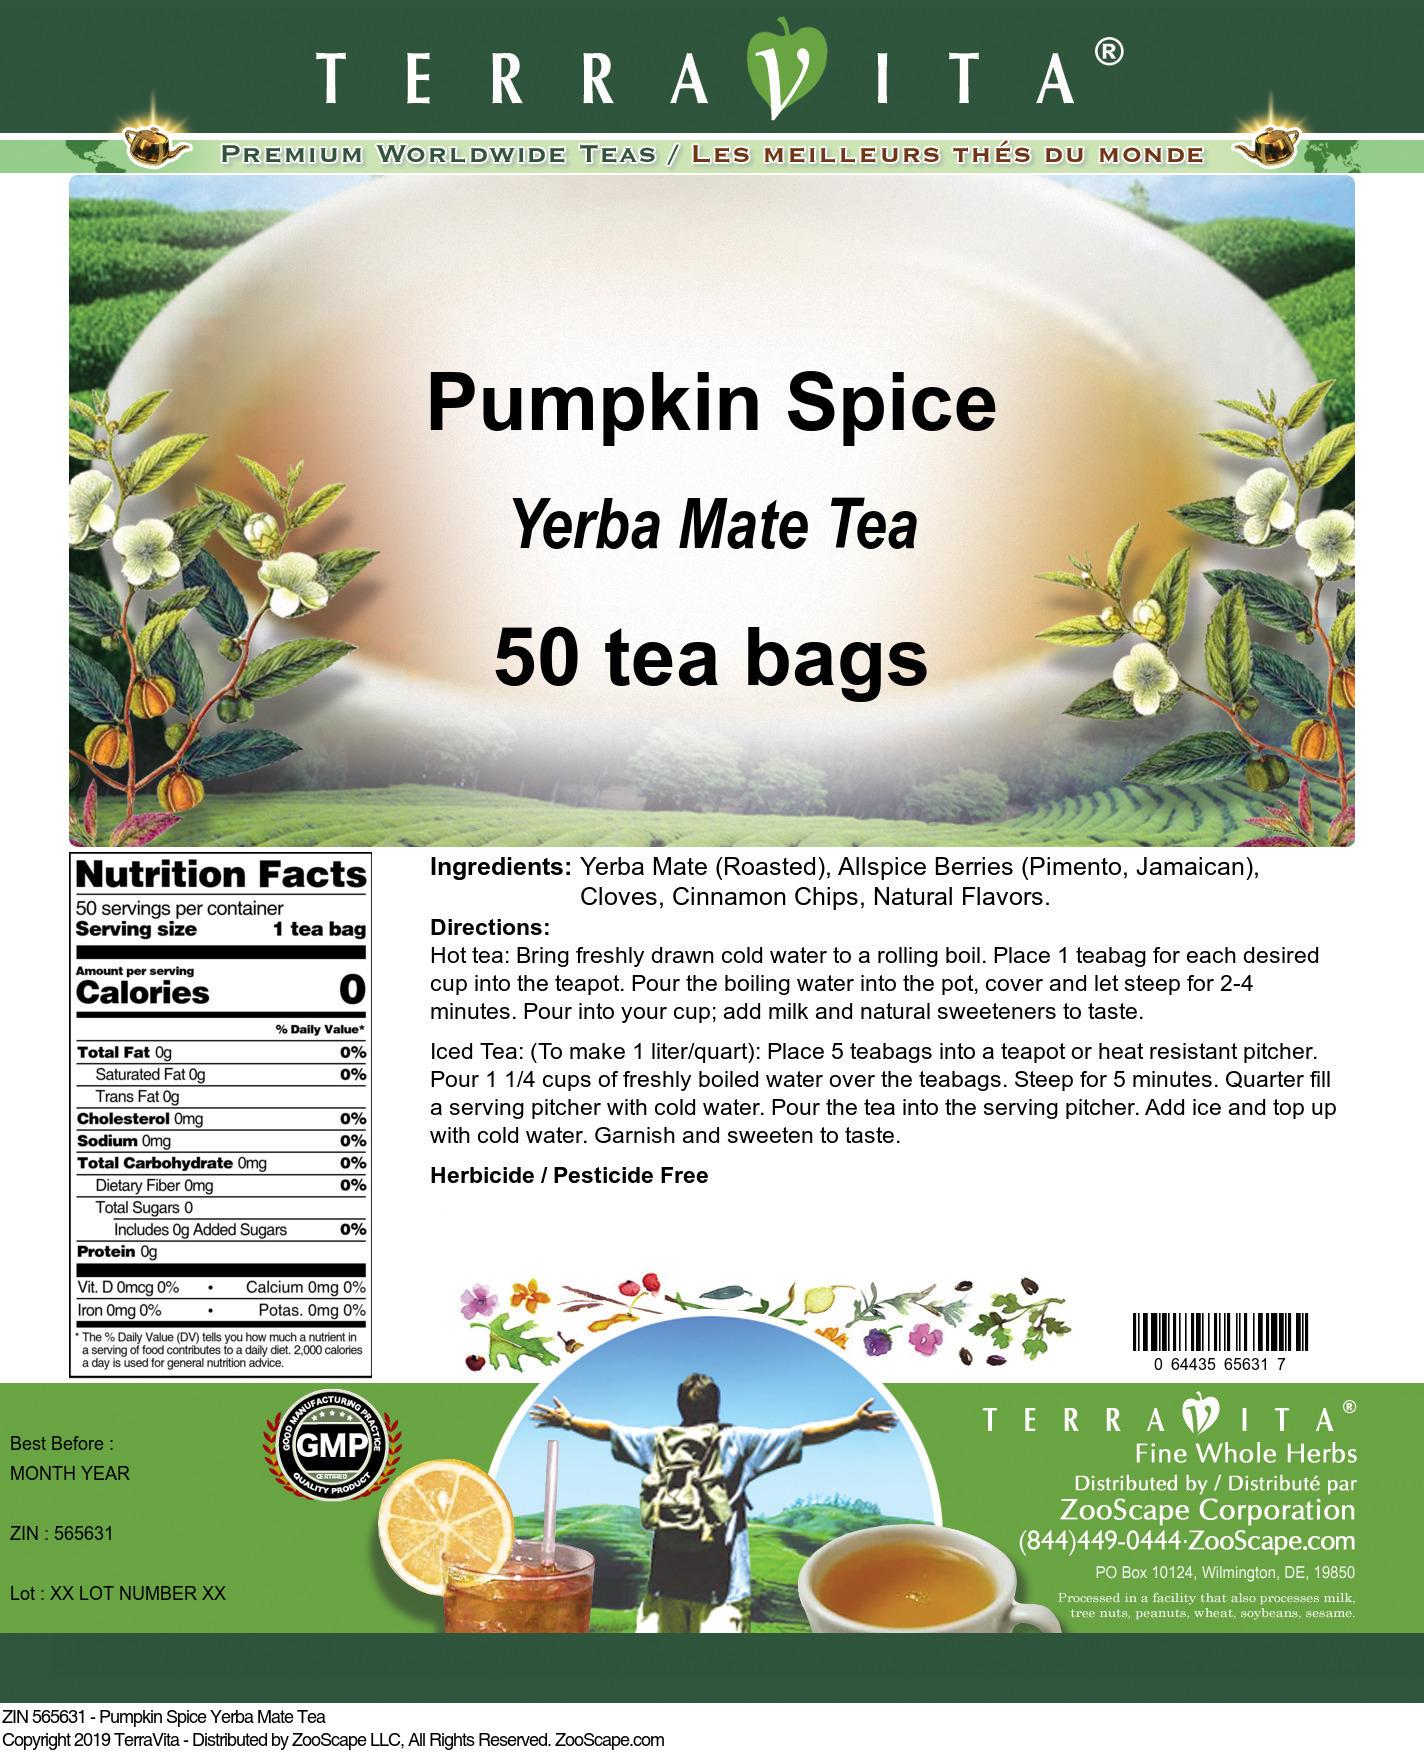 Pumpkin Spice Yerba Mate